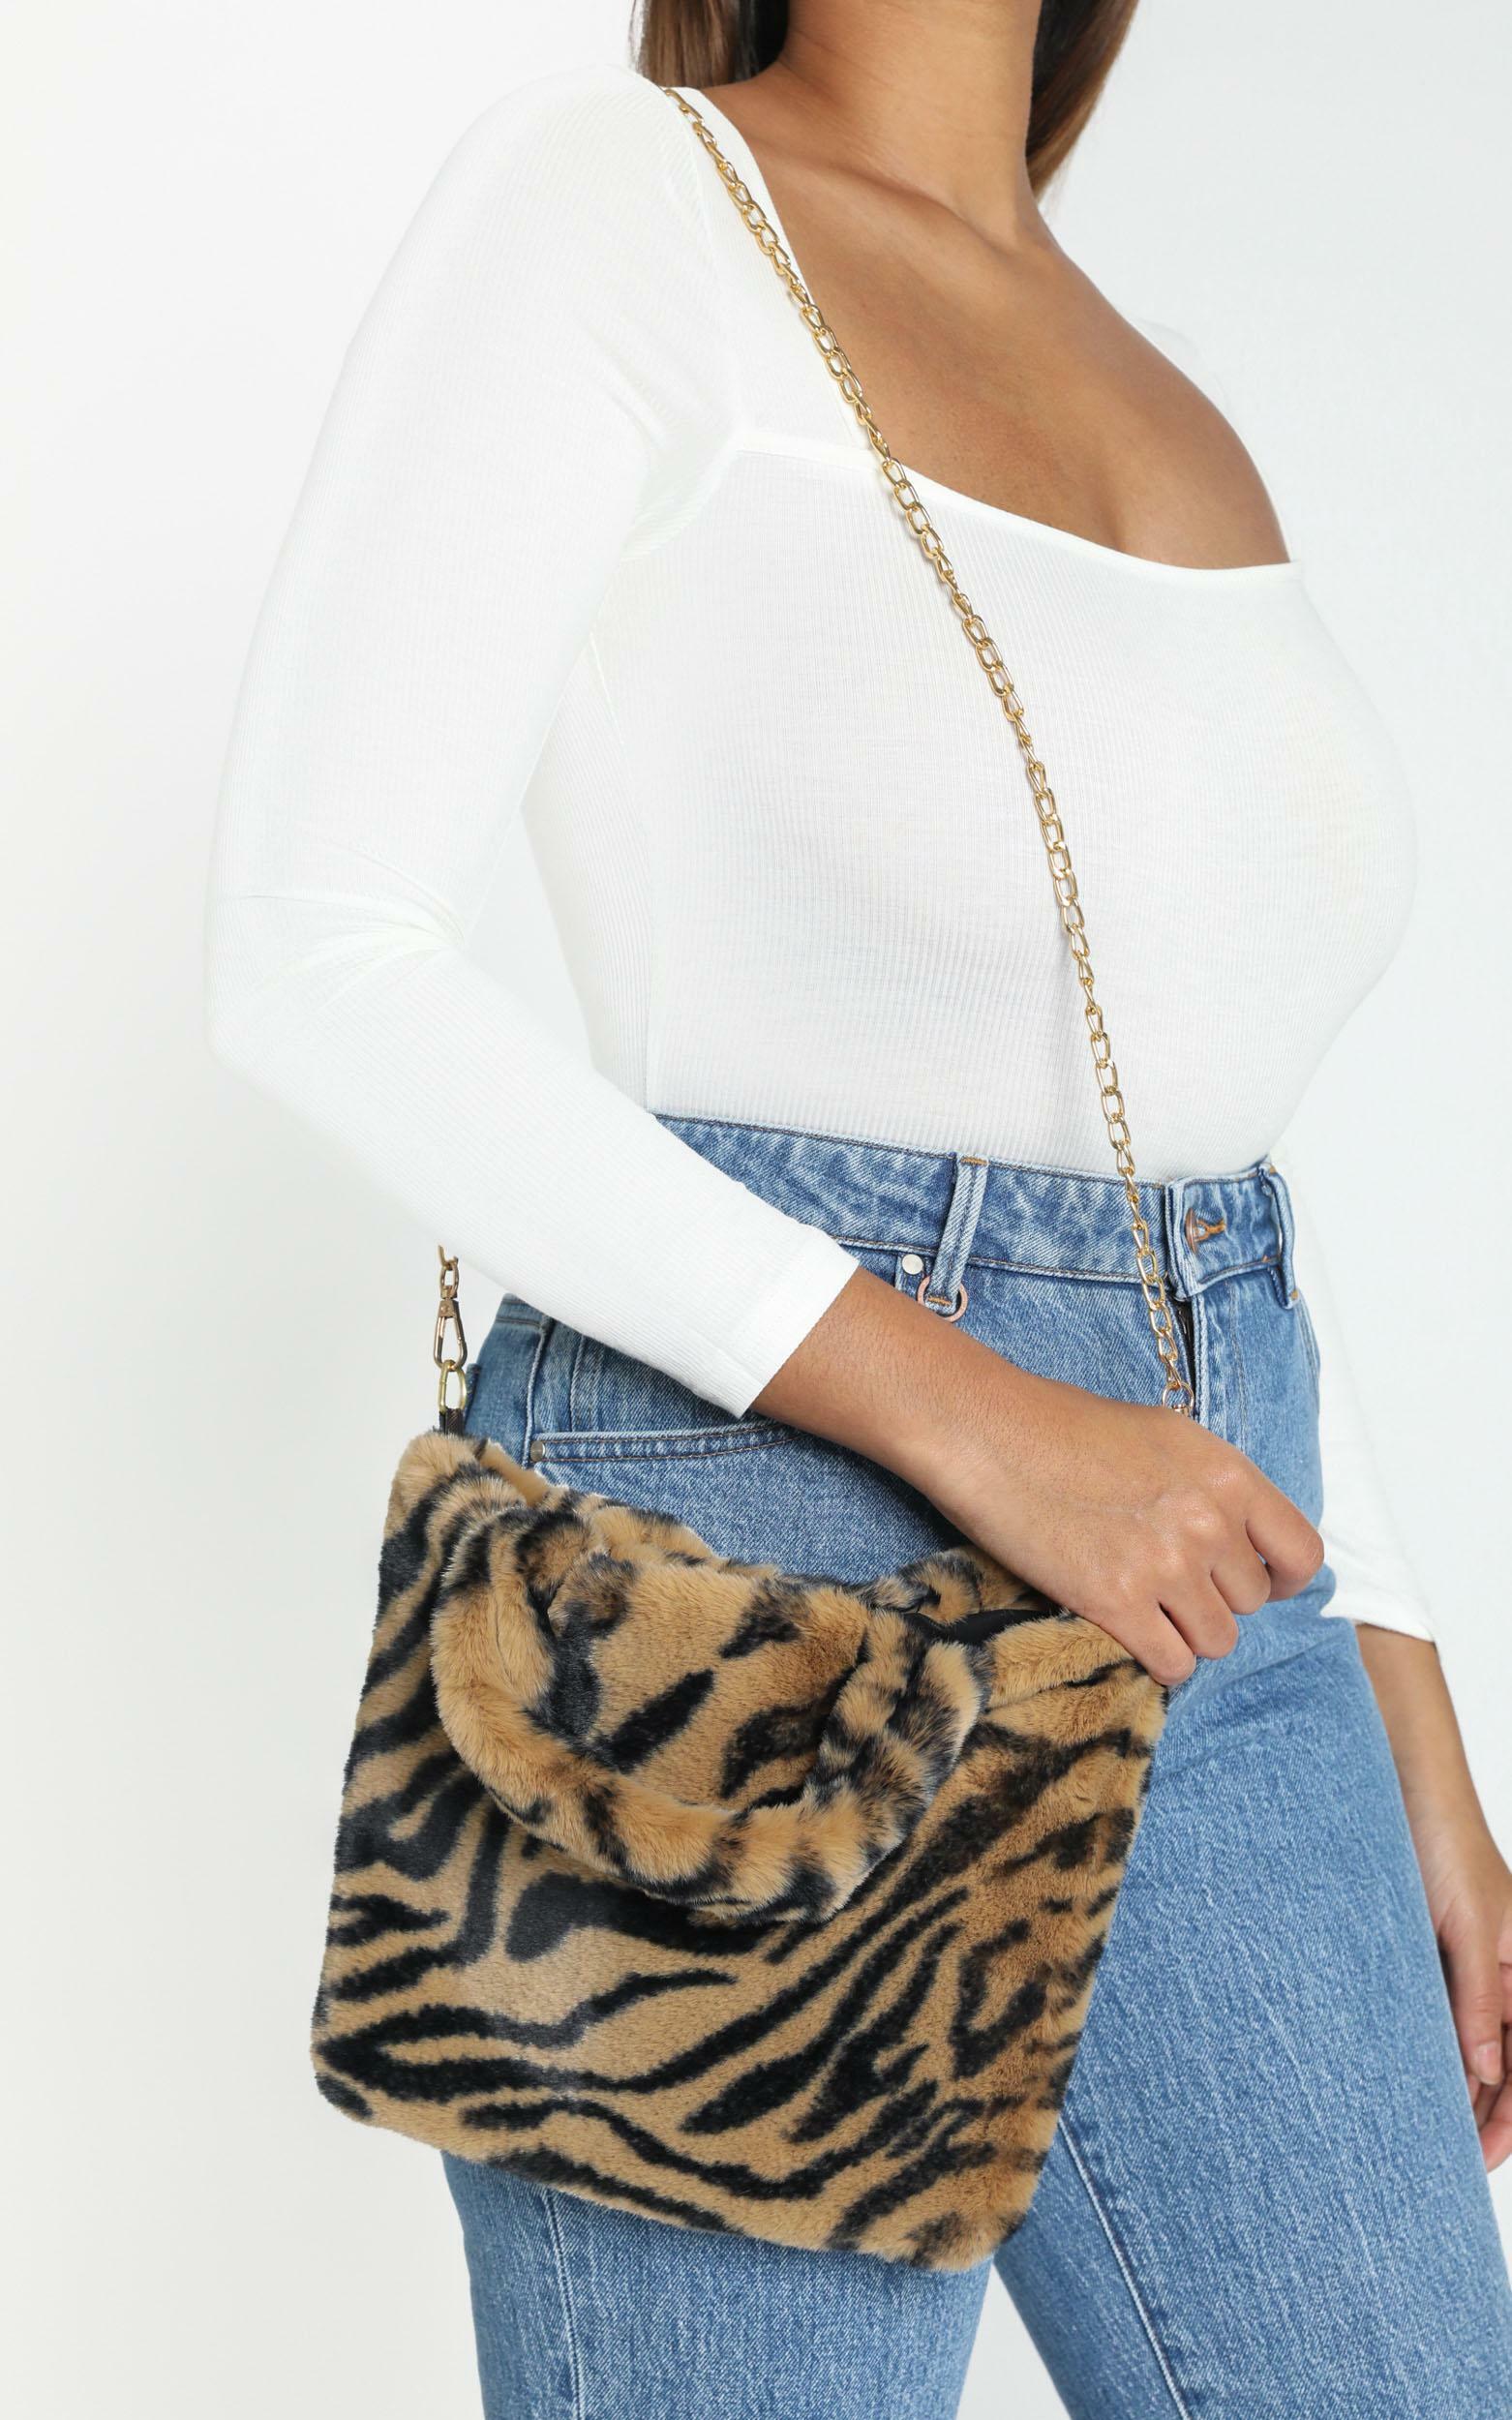 Cool Chic Furry Bag in Tan Zebra, , hi-res image number null